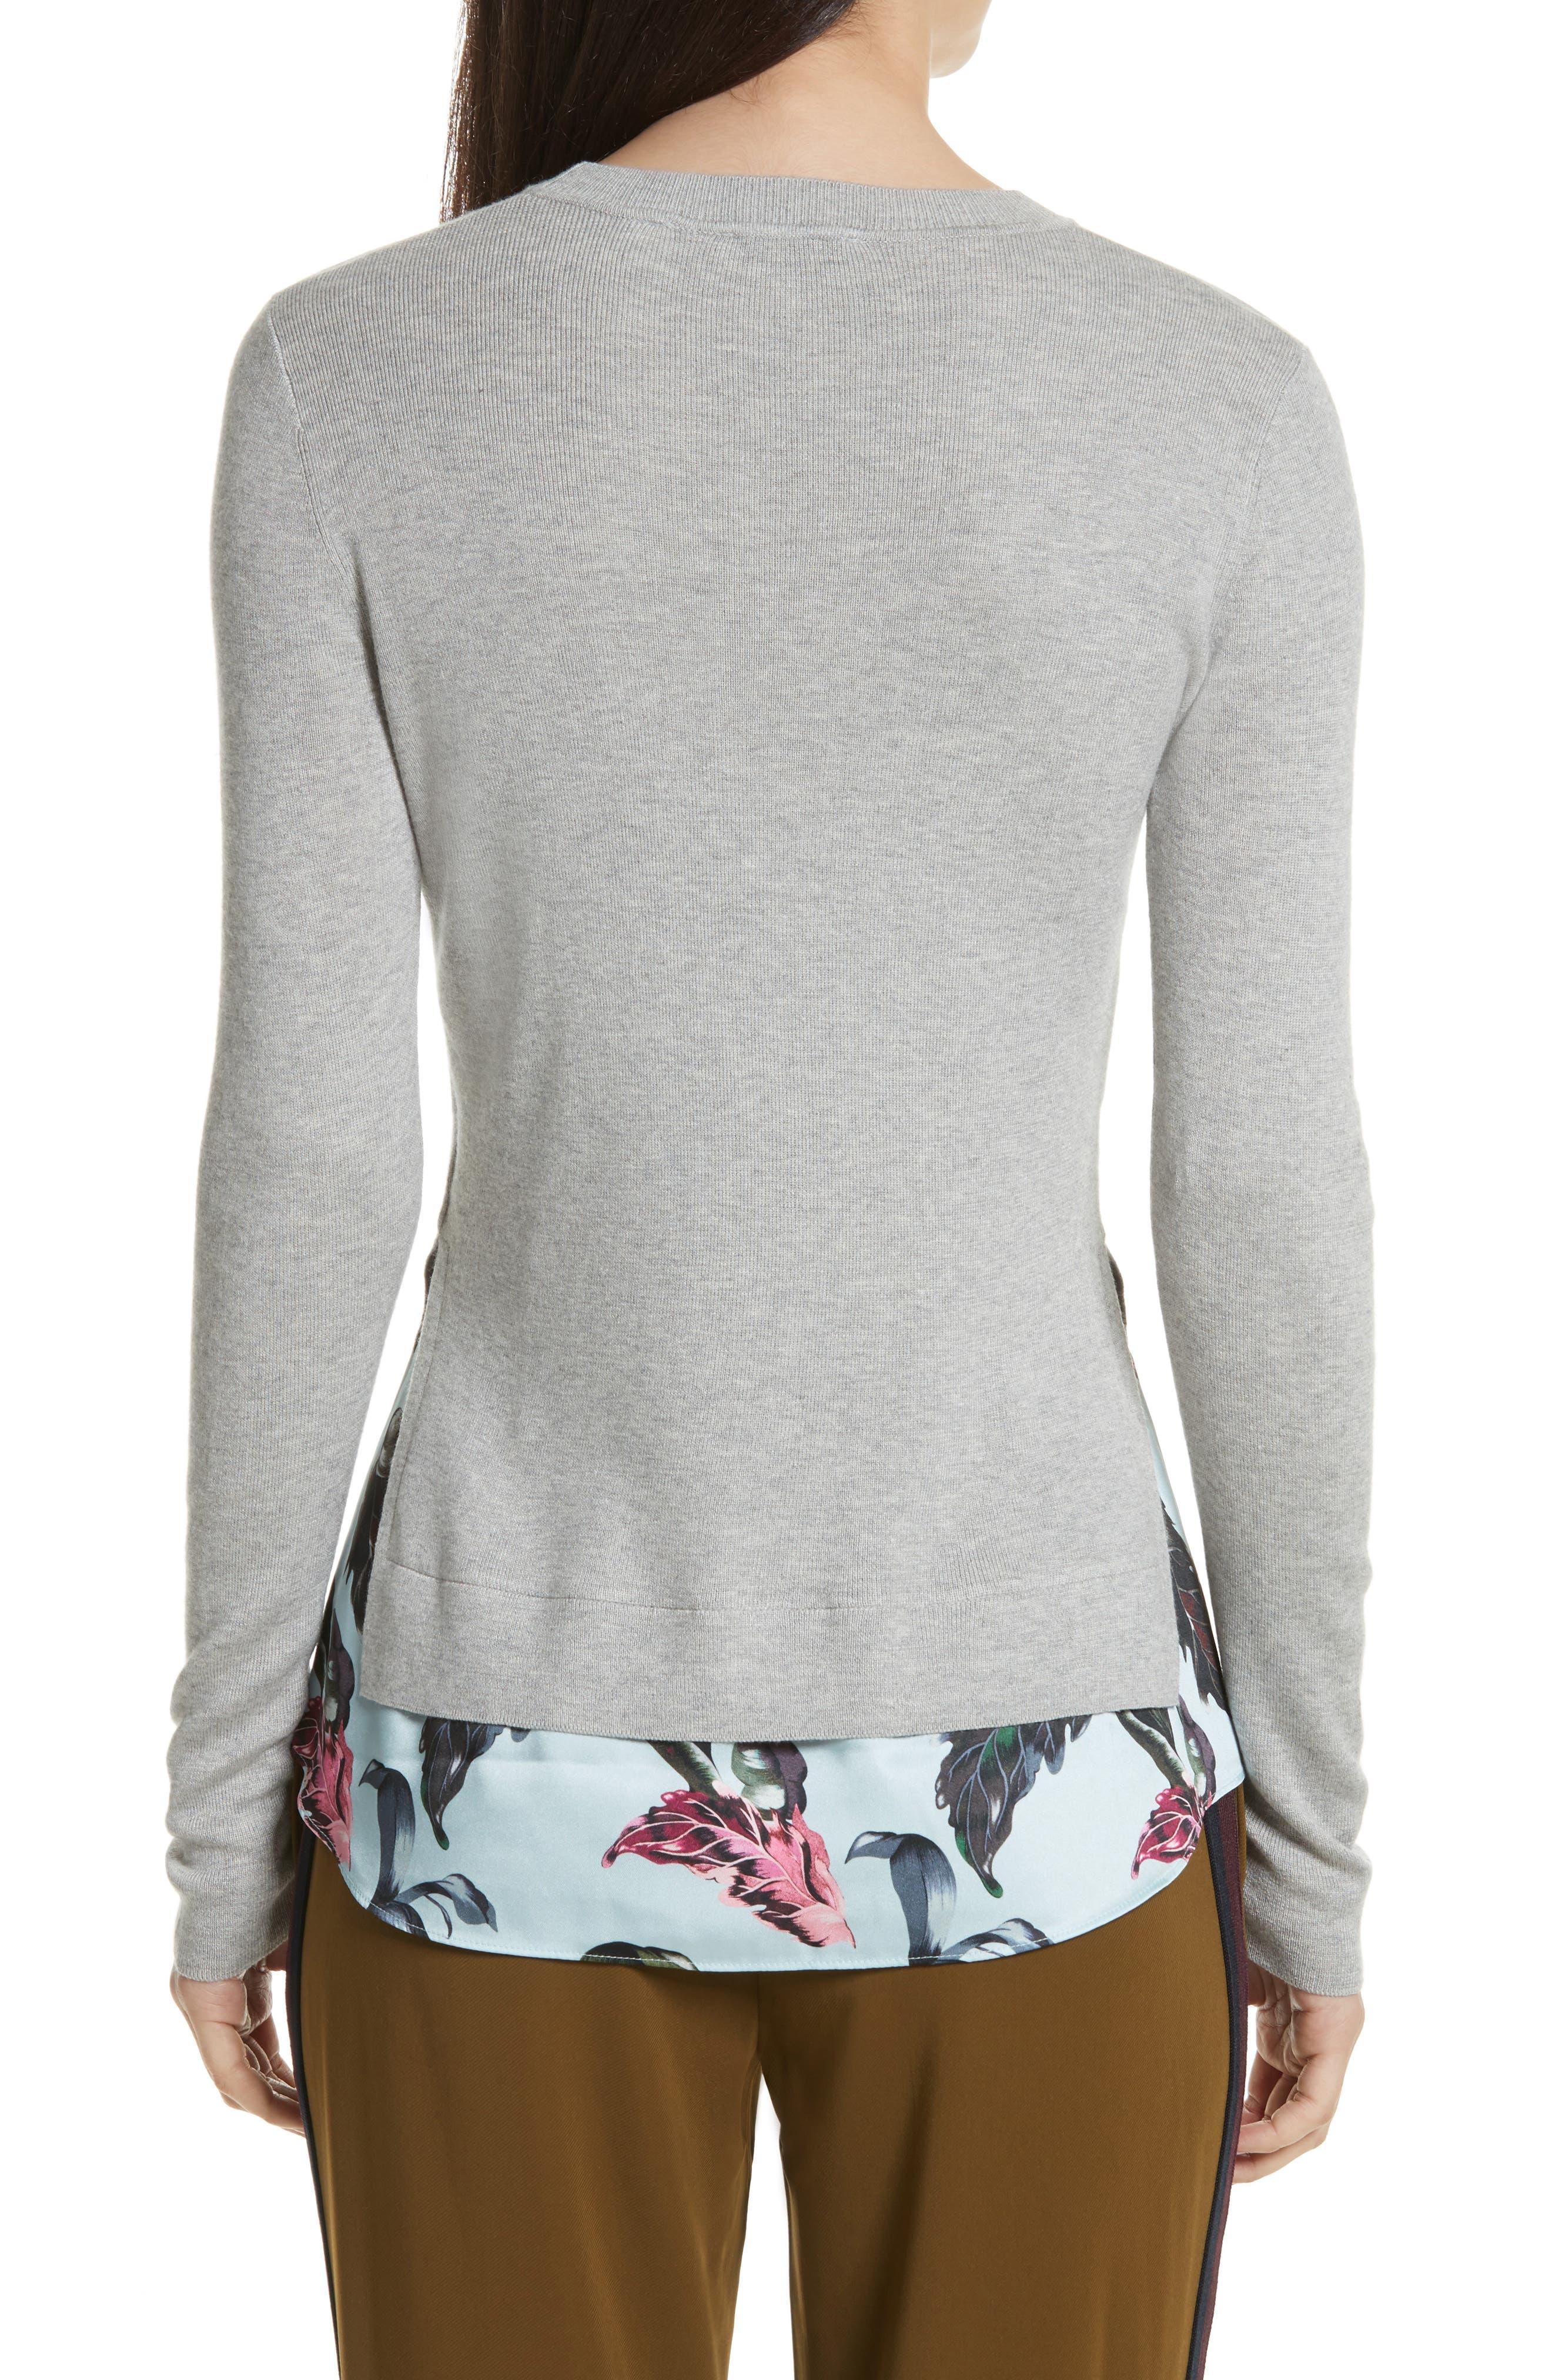 Karley Minerals Mockable Sweater,                             Alternate thumbnail 2, color,                             Light Grey